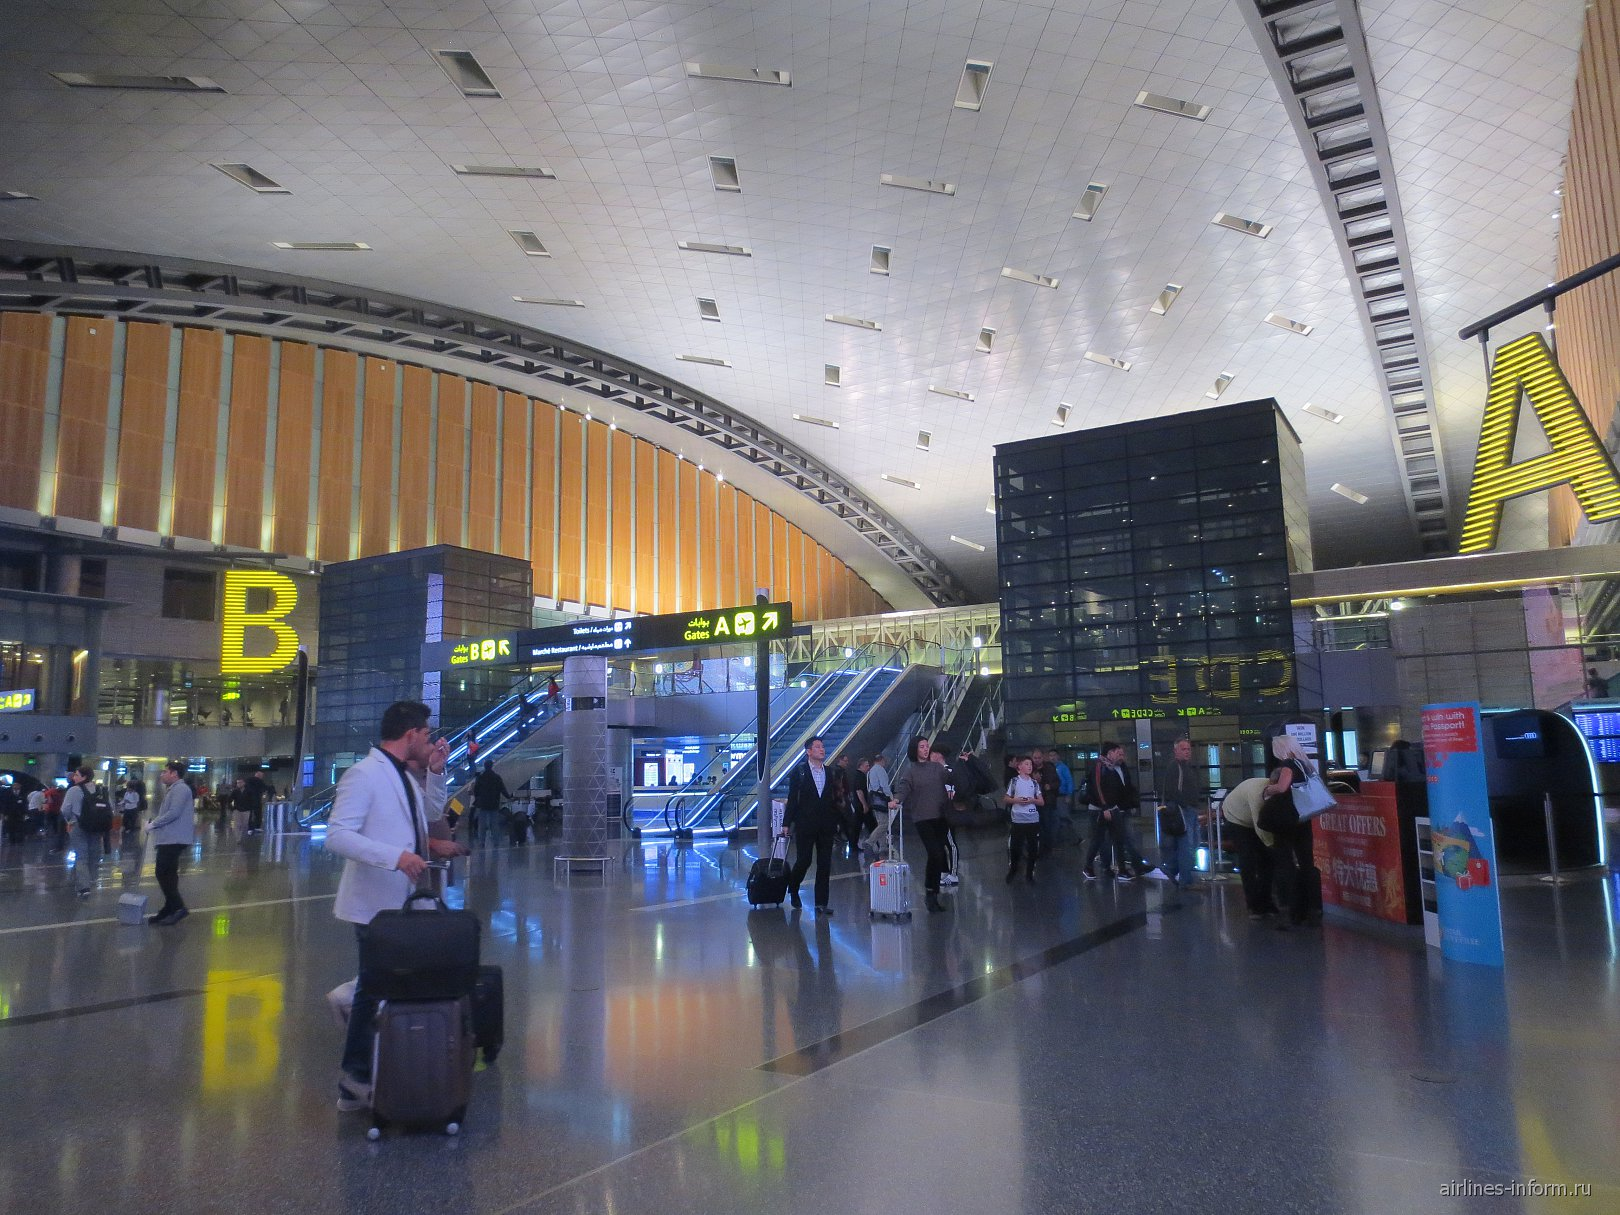 Центральная часть пассажирского терминала аэропорта Хамад